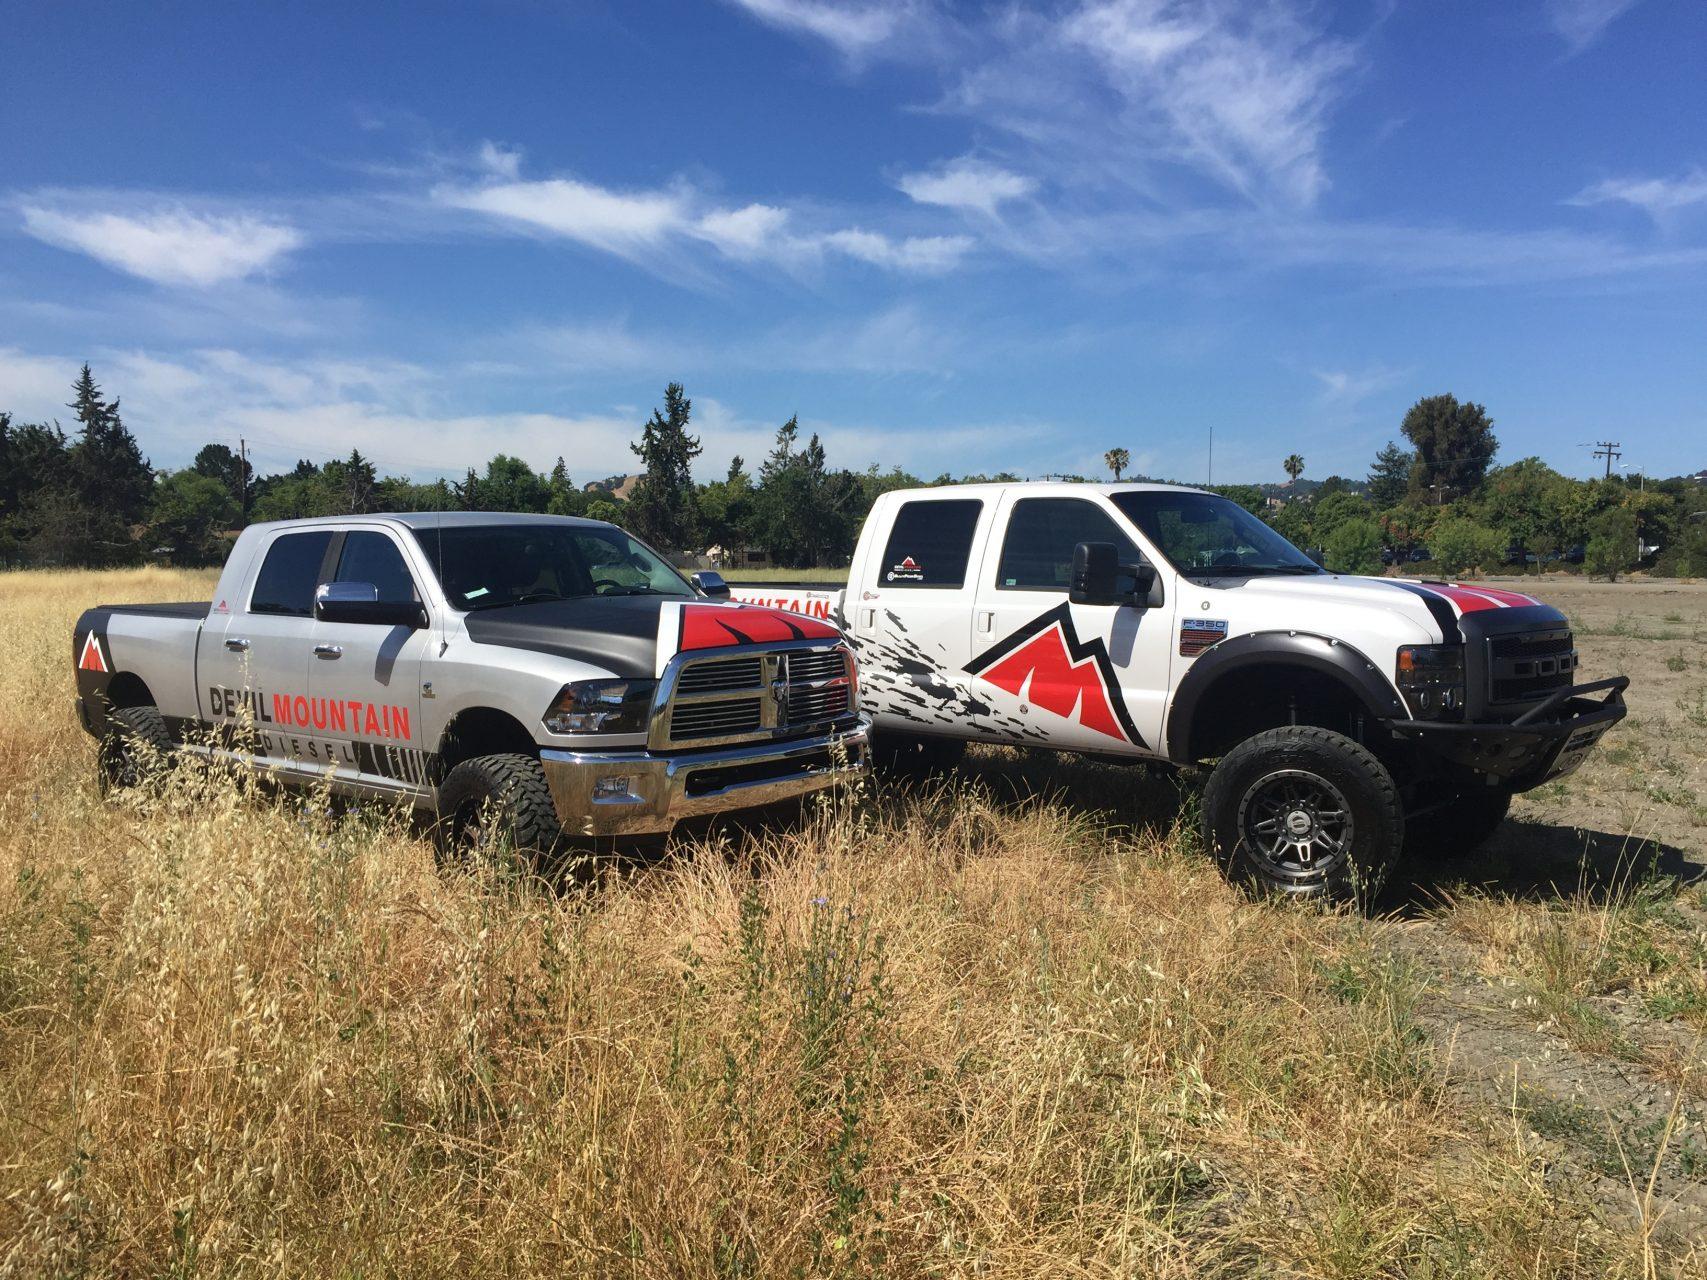 Fleet Vehicle Graphics - Sequoia Signs Concord